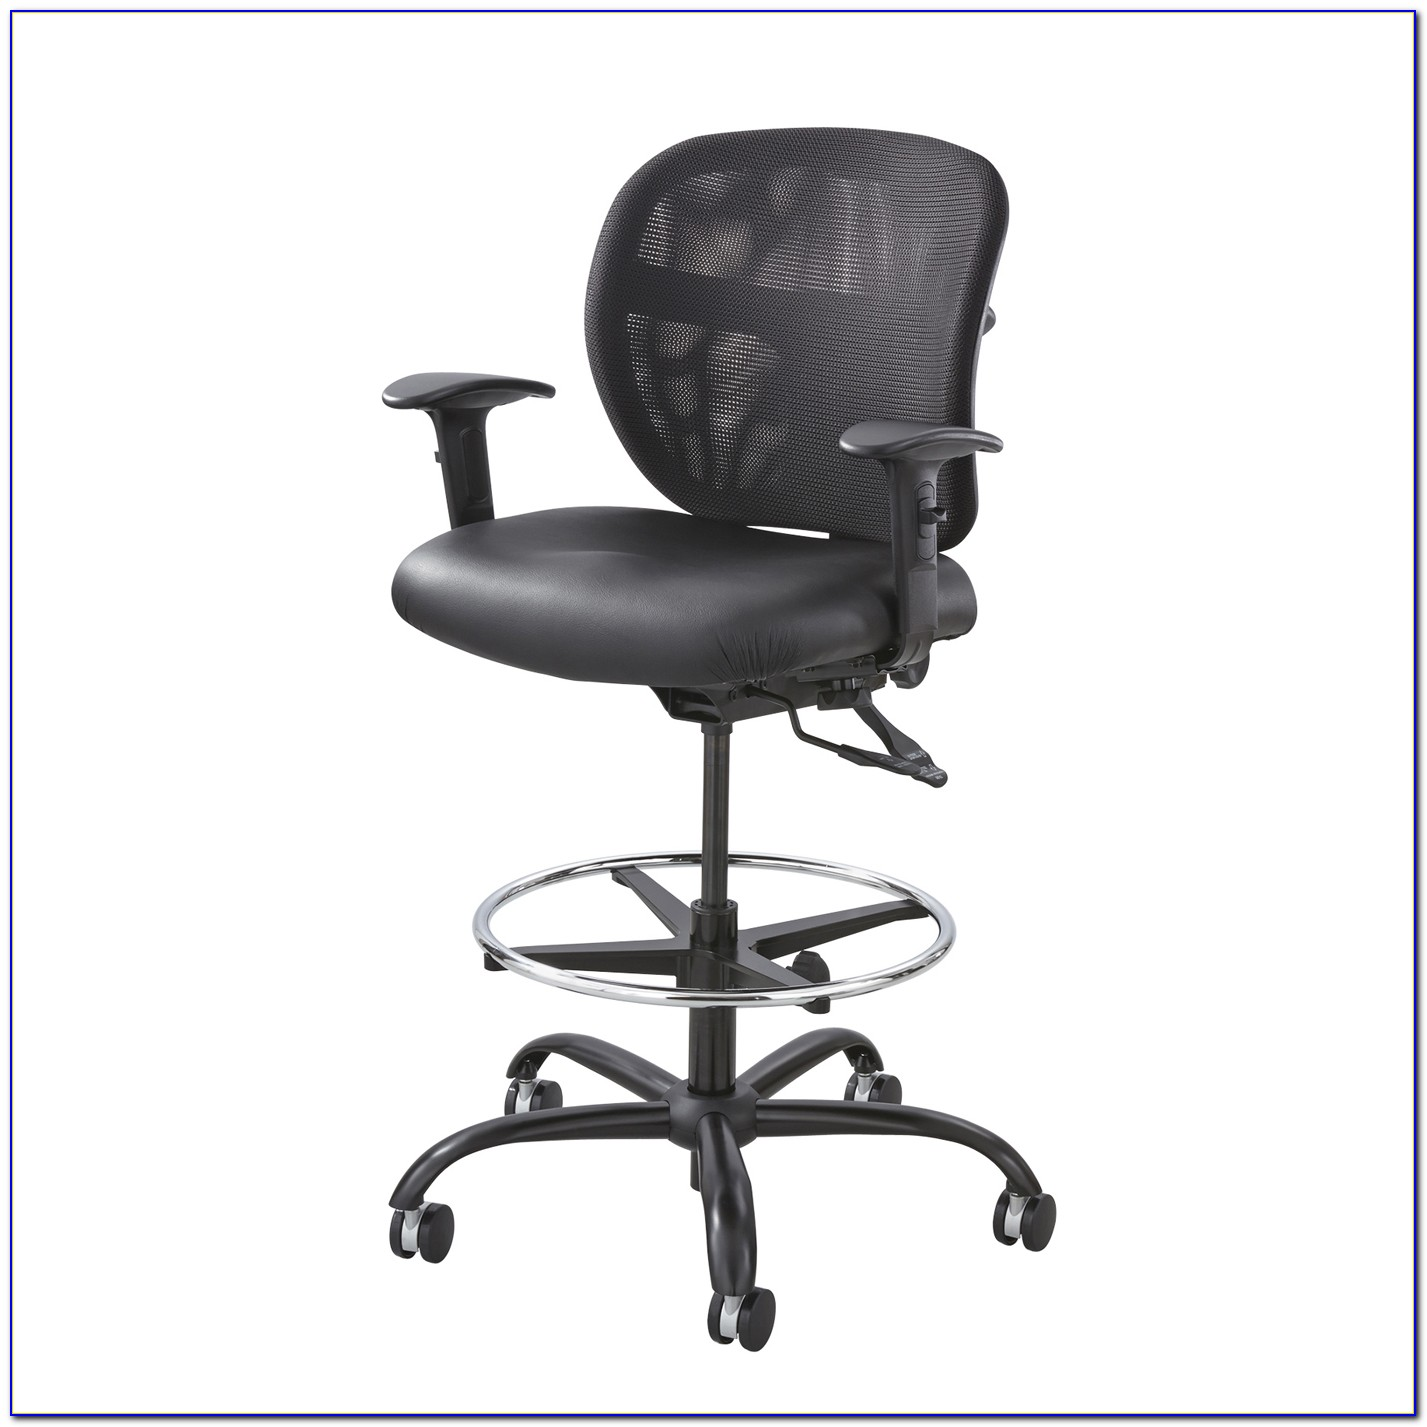 Heavy Duty Office Chairs 600 Lbs